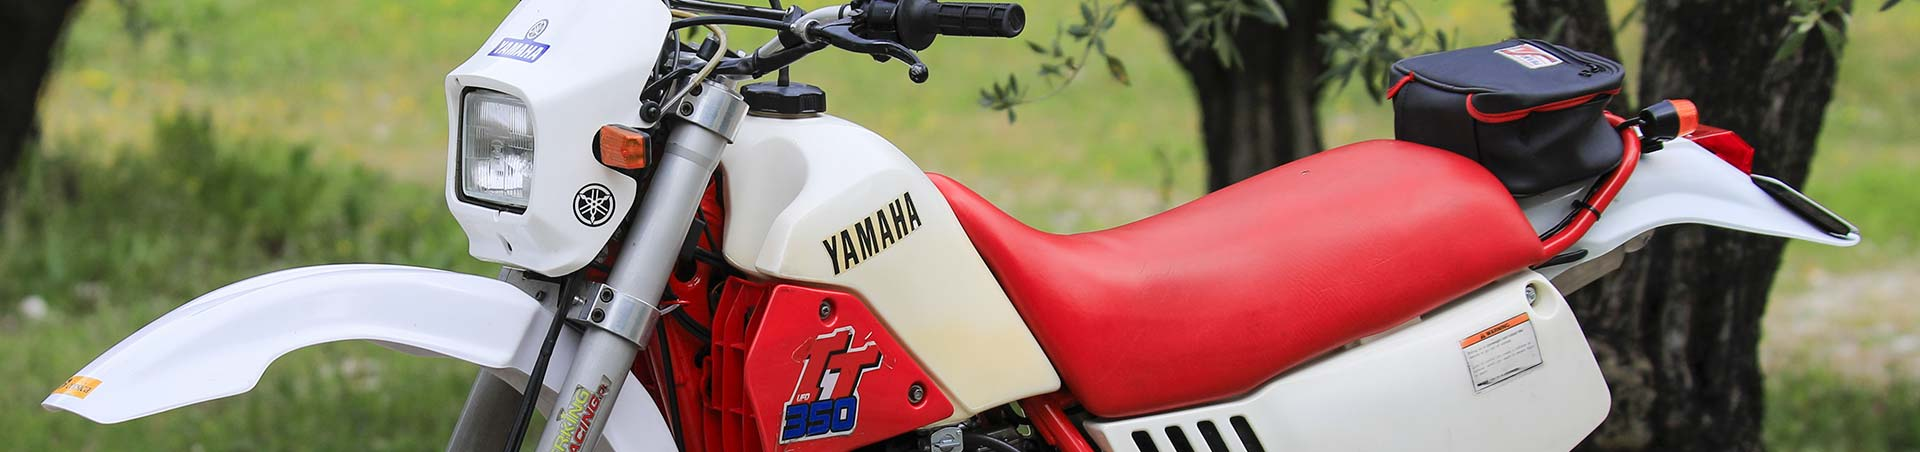 Yamaha-TT-350